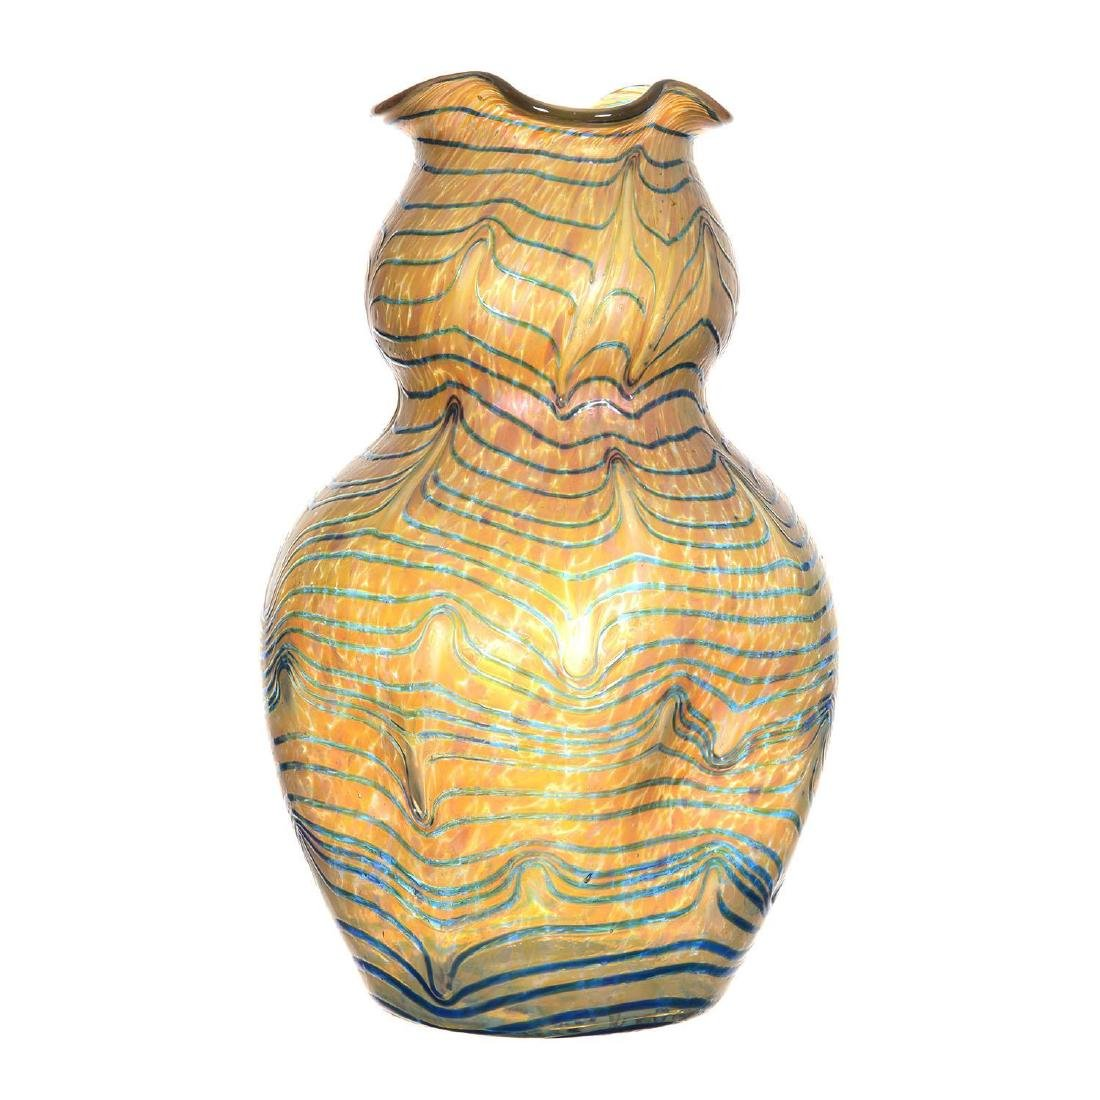 "11.75"" X 7"" Unmarked Kralik Art Glass Vase"